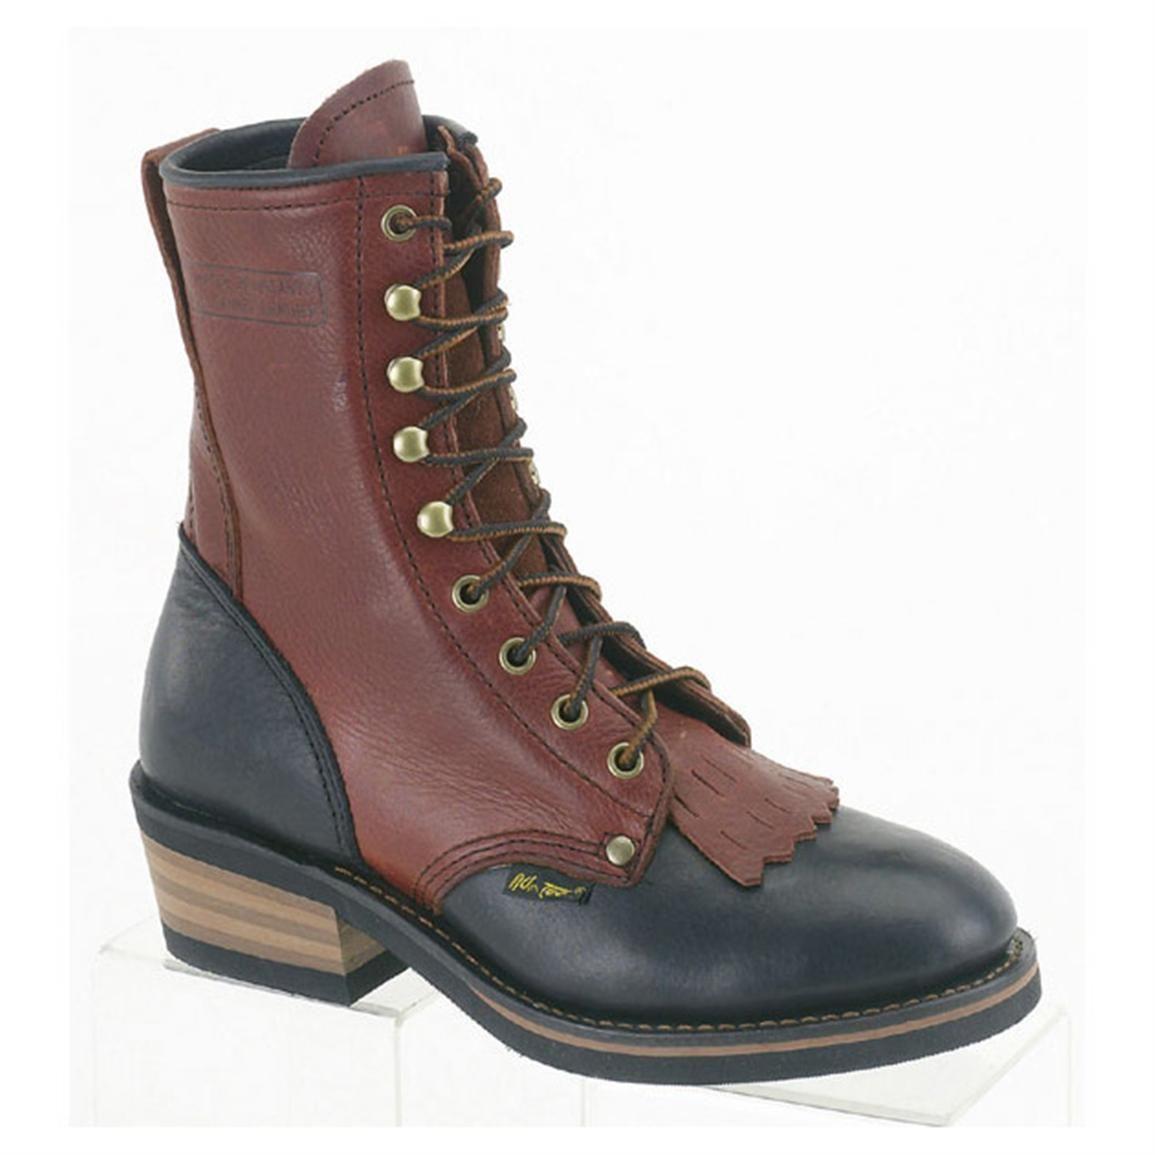 Women's 8 inch Ad Tec® Western Packer Boots, Black / Dark Cherry